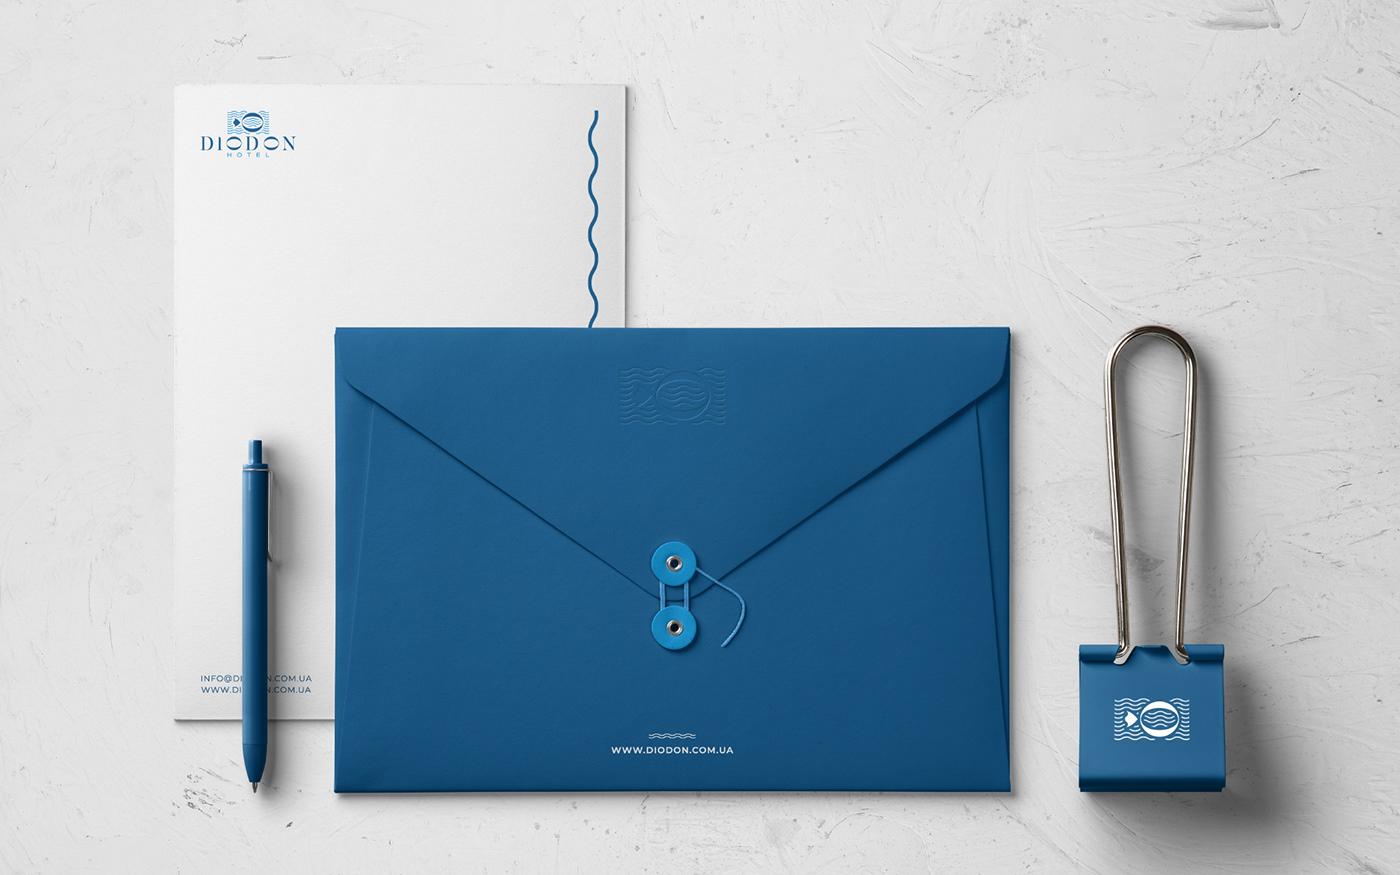 logo,Logotype,Web,site,Website,Webdesign,brochure,corporate style,identity,hotel